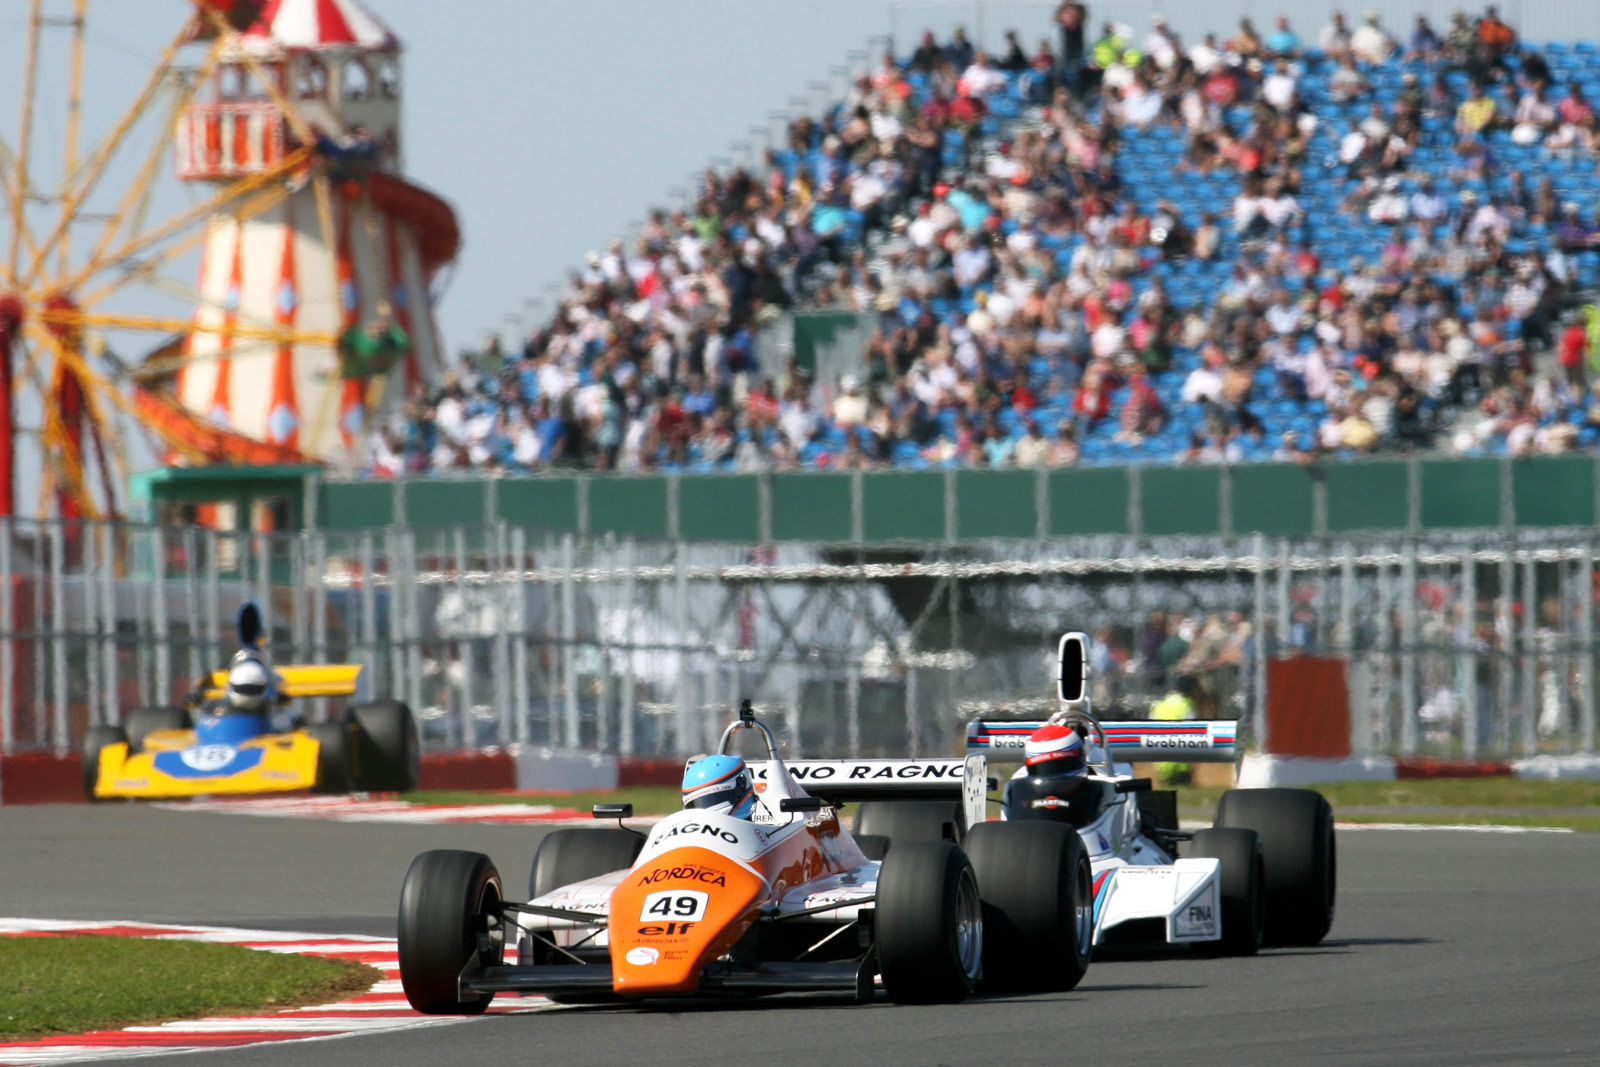 FIA Masters Historic Formula One race Silverstone